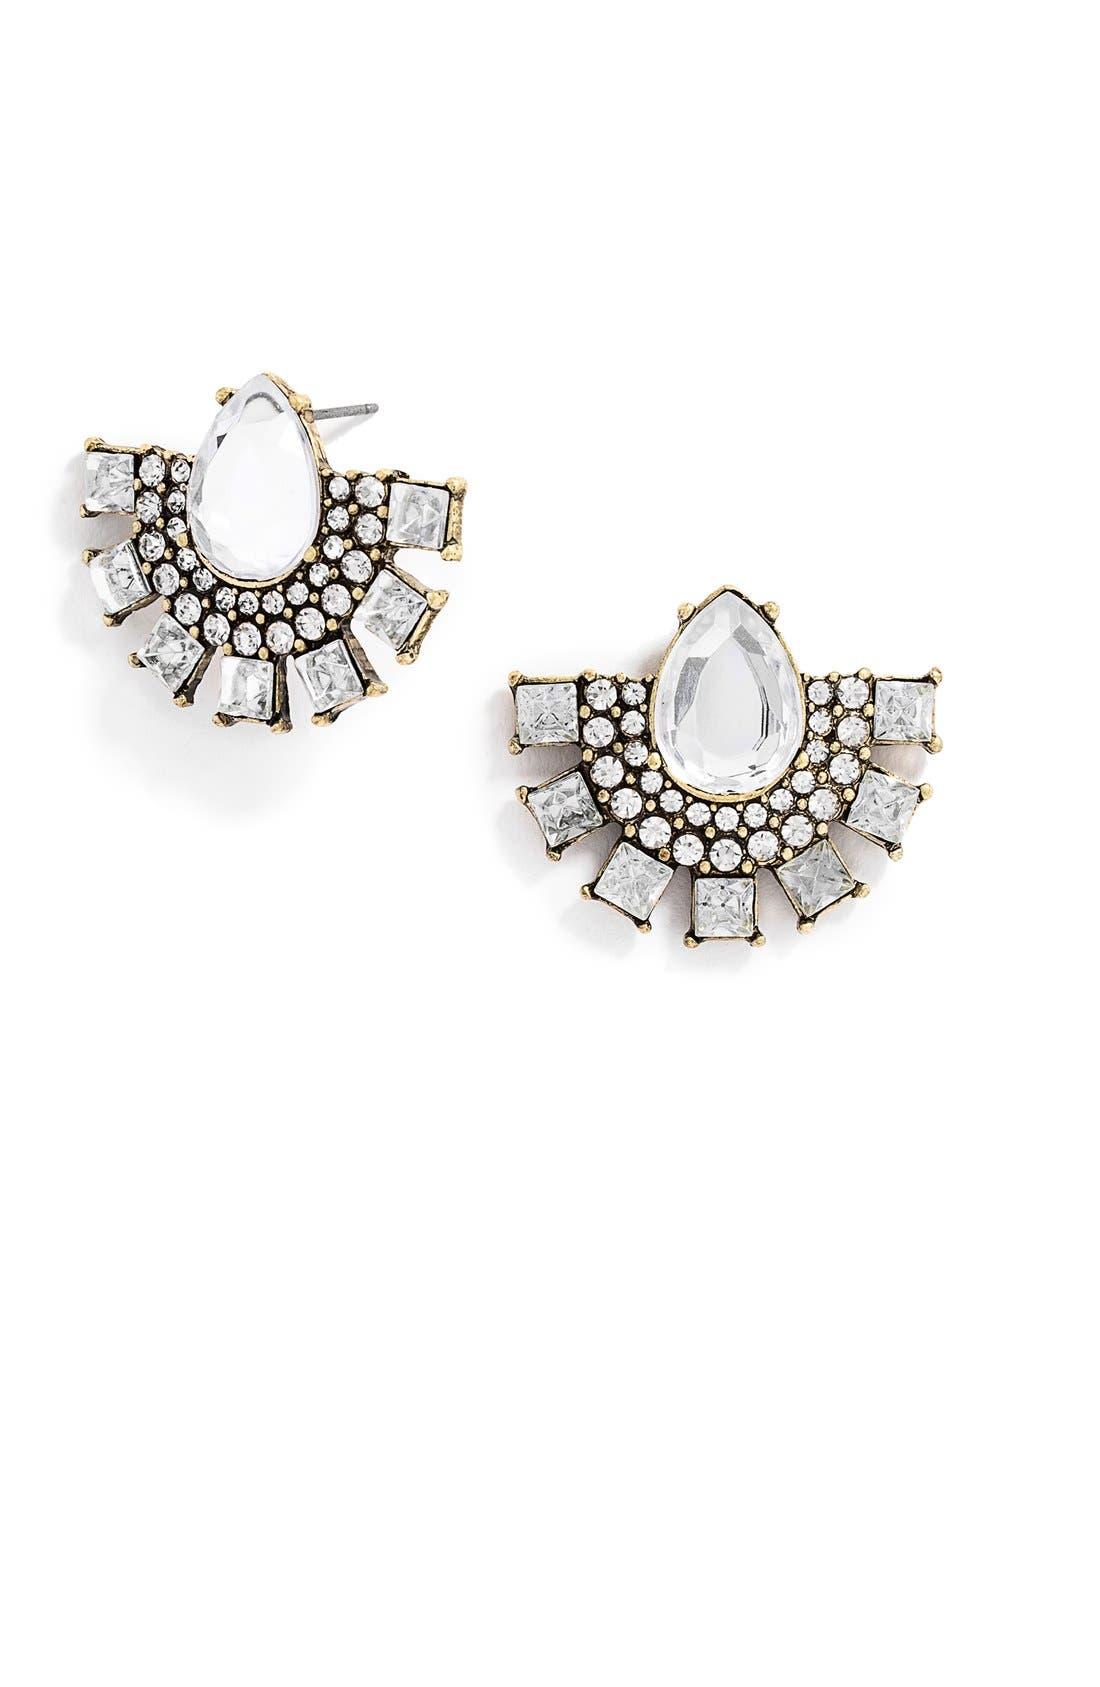 Main Image - Baublebar 'Parasol' Statement Stud Earrings